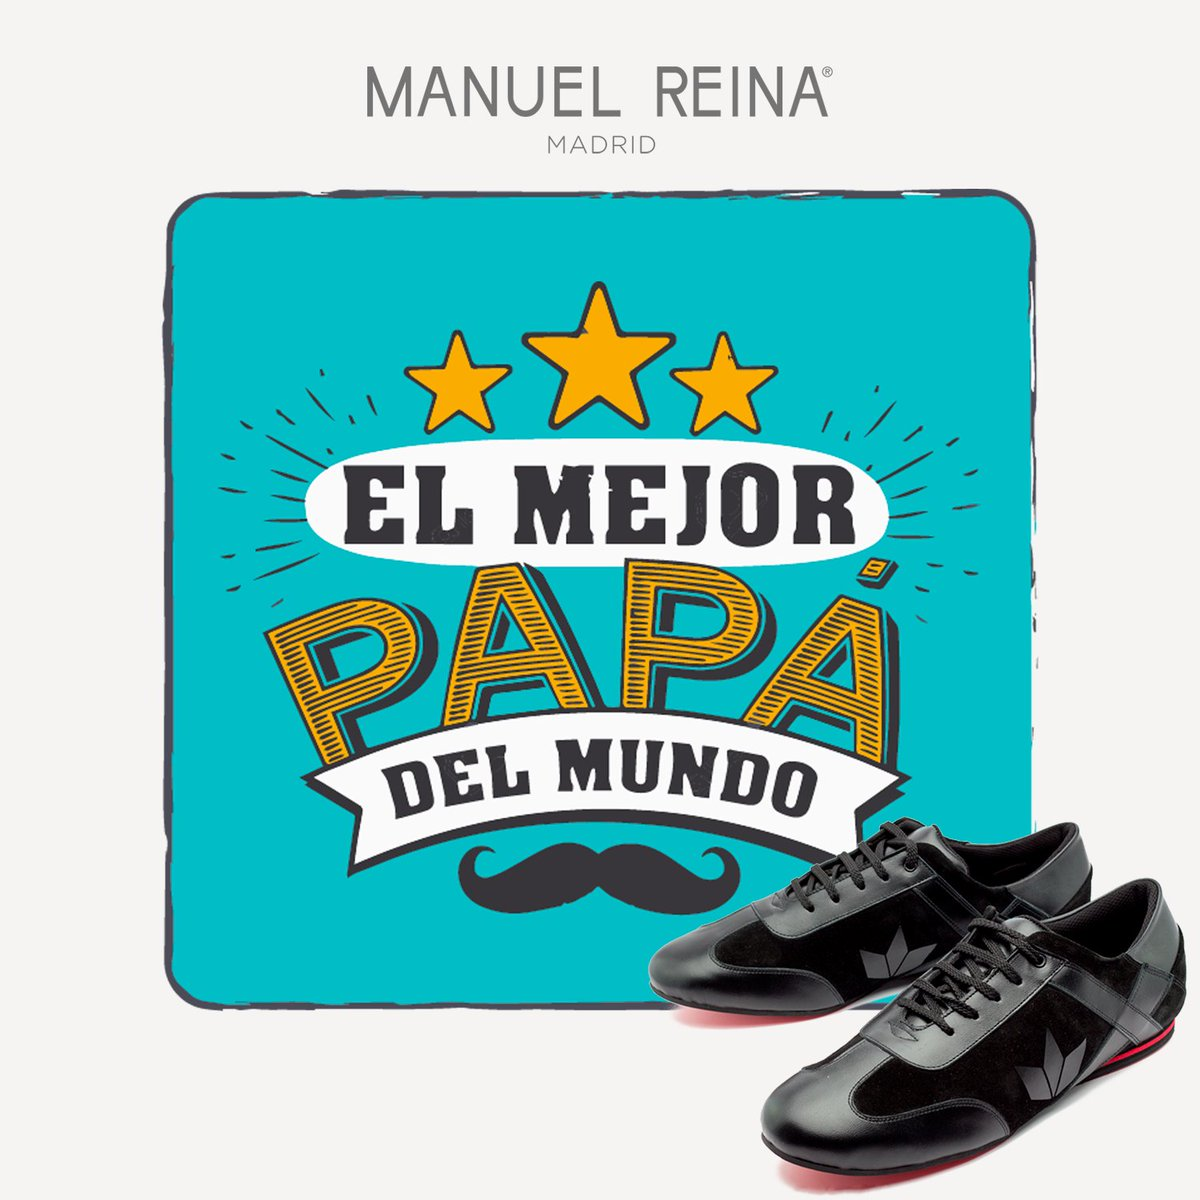 Feliz día a toda los papás del mundo #felizdiadelpadre • • • • • #diadelpadre #manuelreina #fatherandson #fathersday #love #dance #dancer #vive #vida #amorpic.twitter.com/mk1jdvSr2c